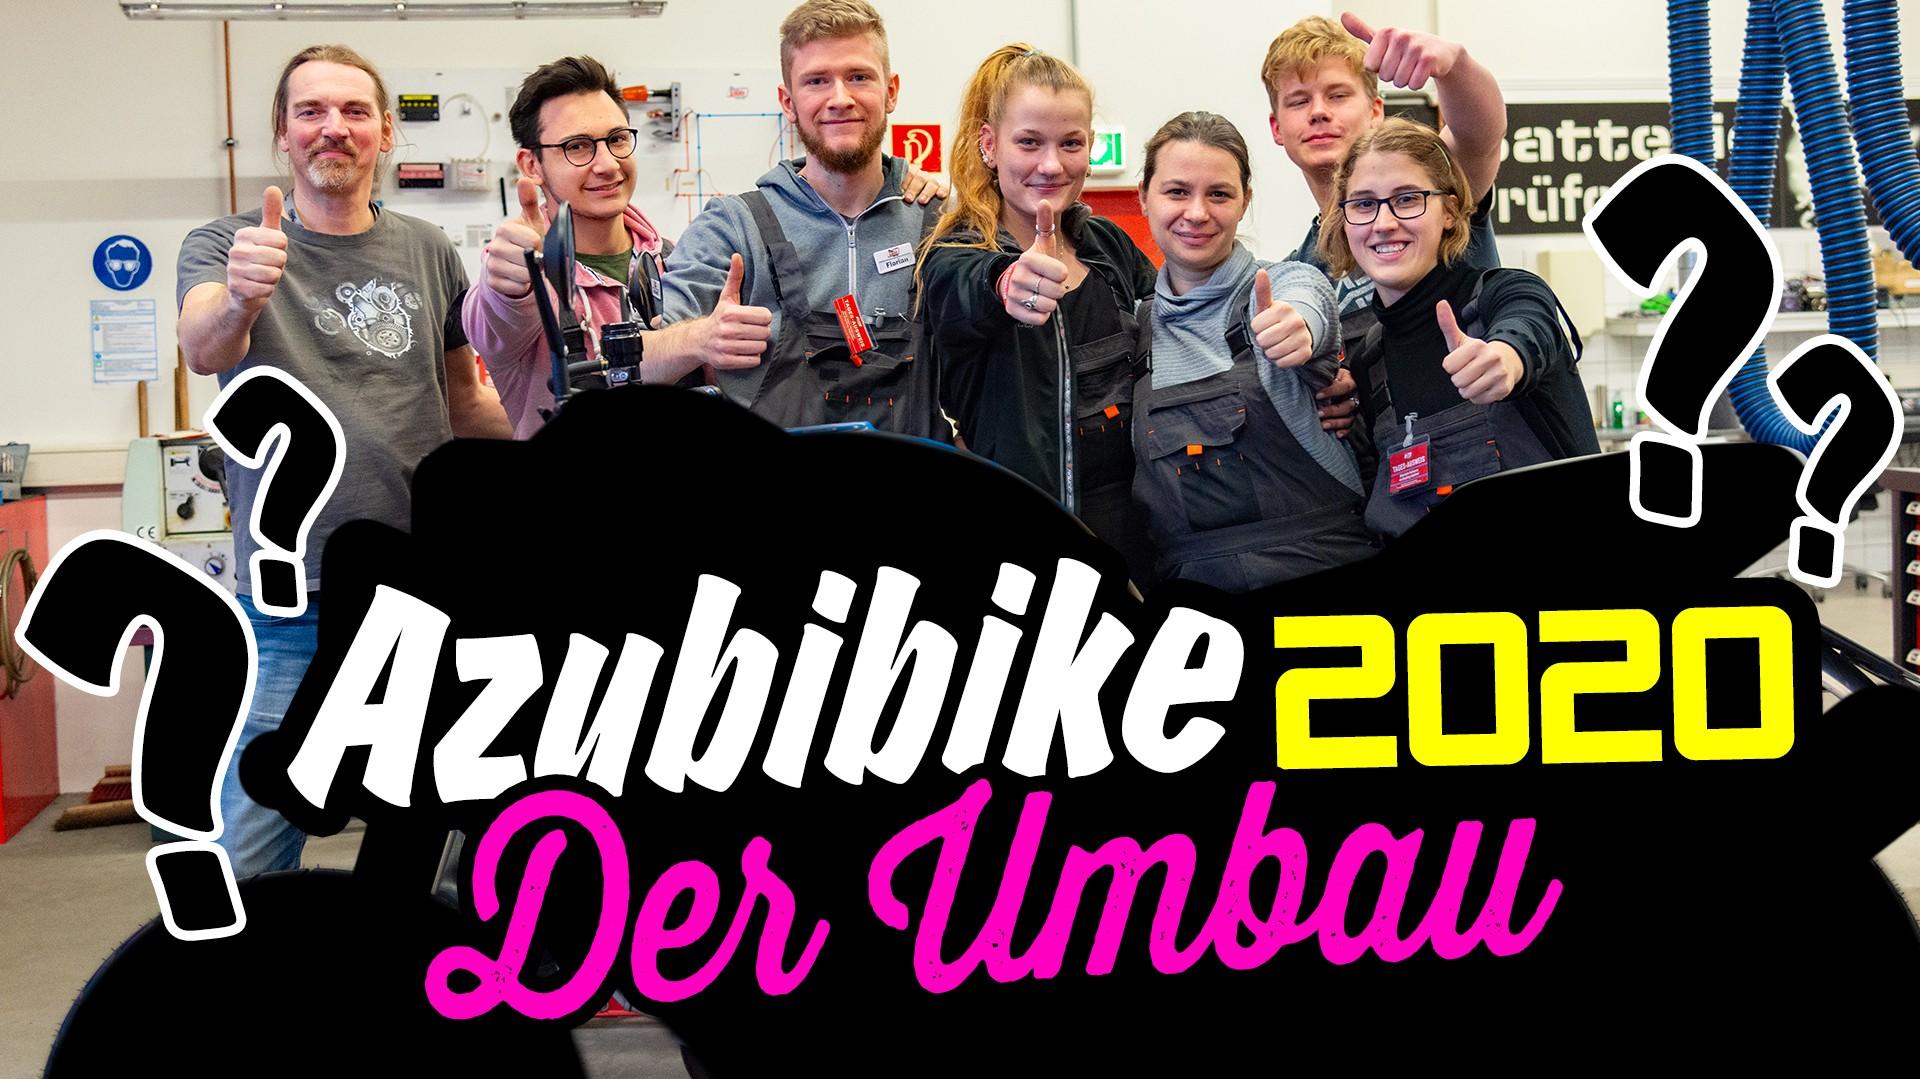 PROJEKT: AZUBIBIKE 2020 Teil 2 – Der Umbau